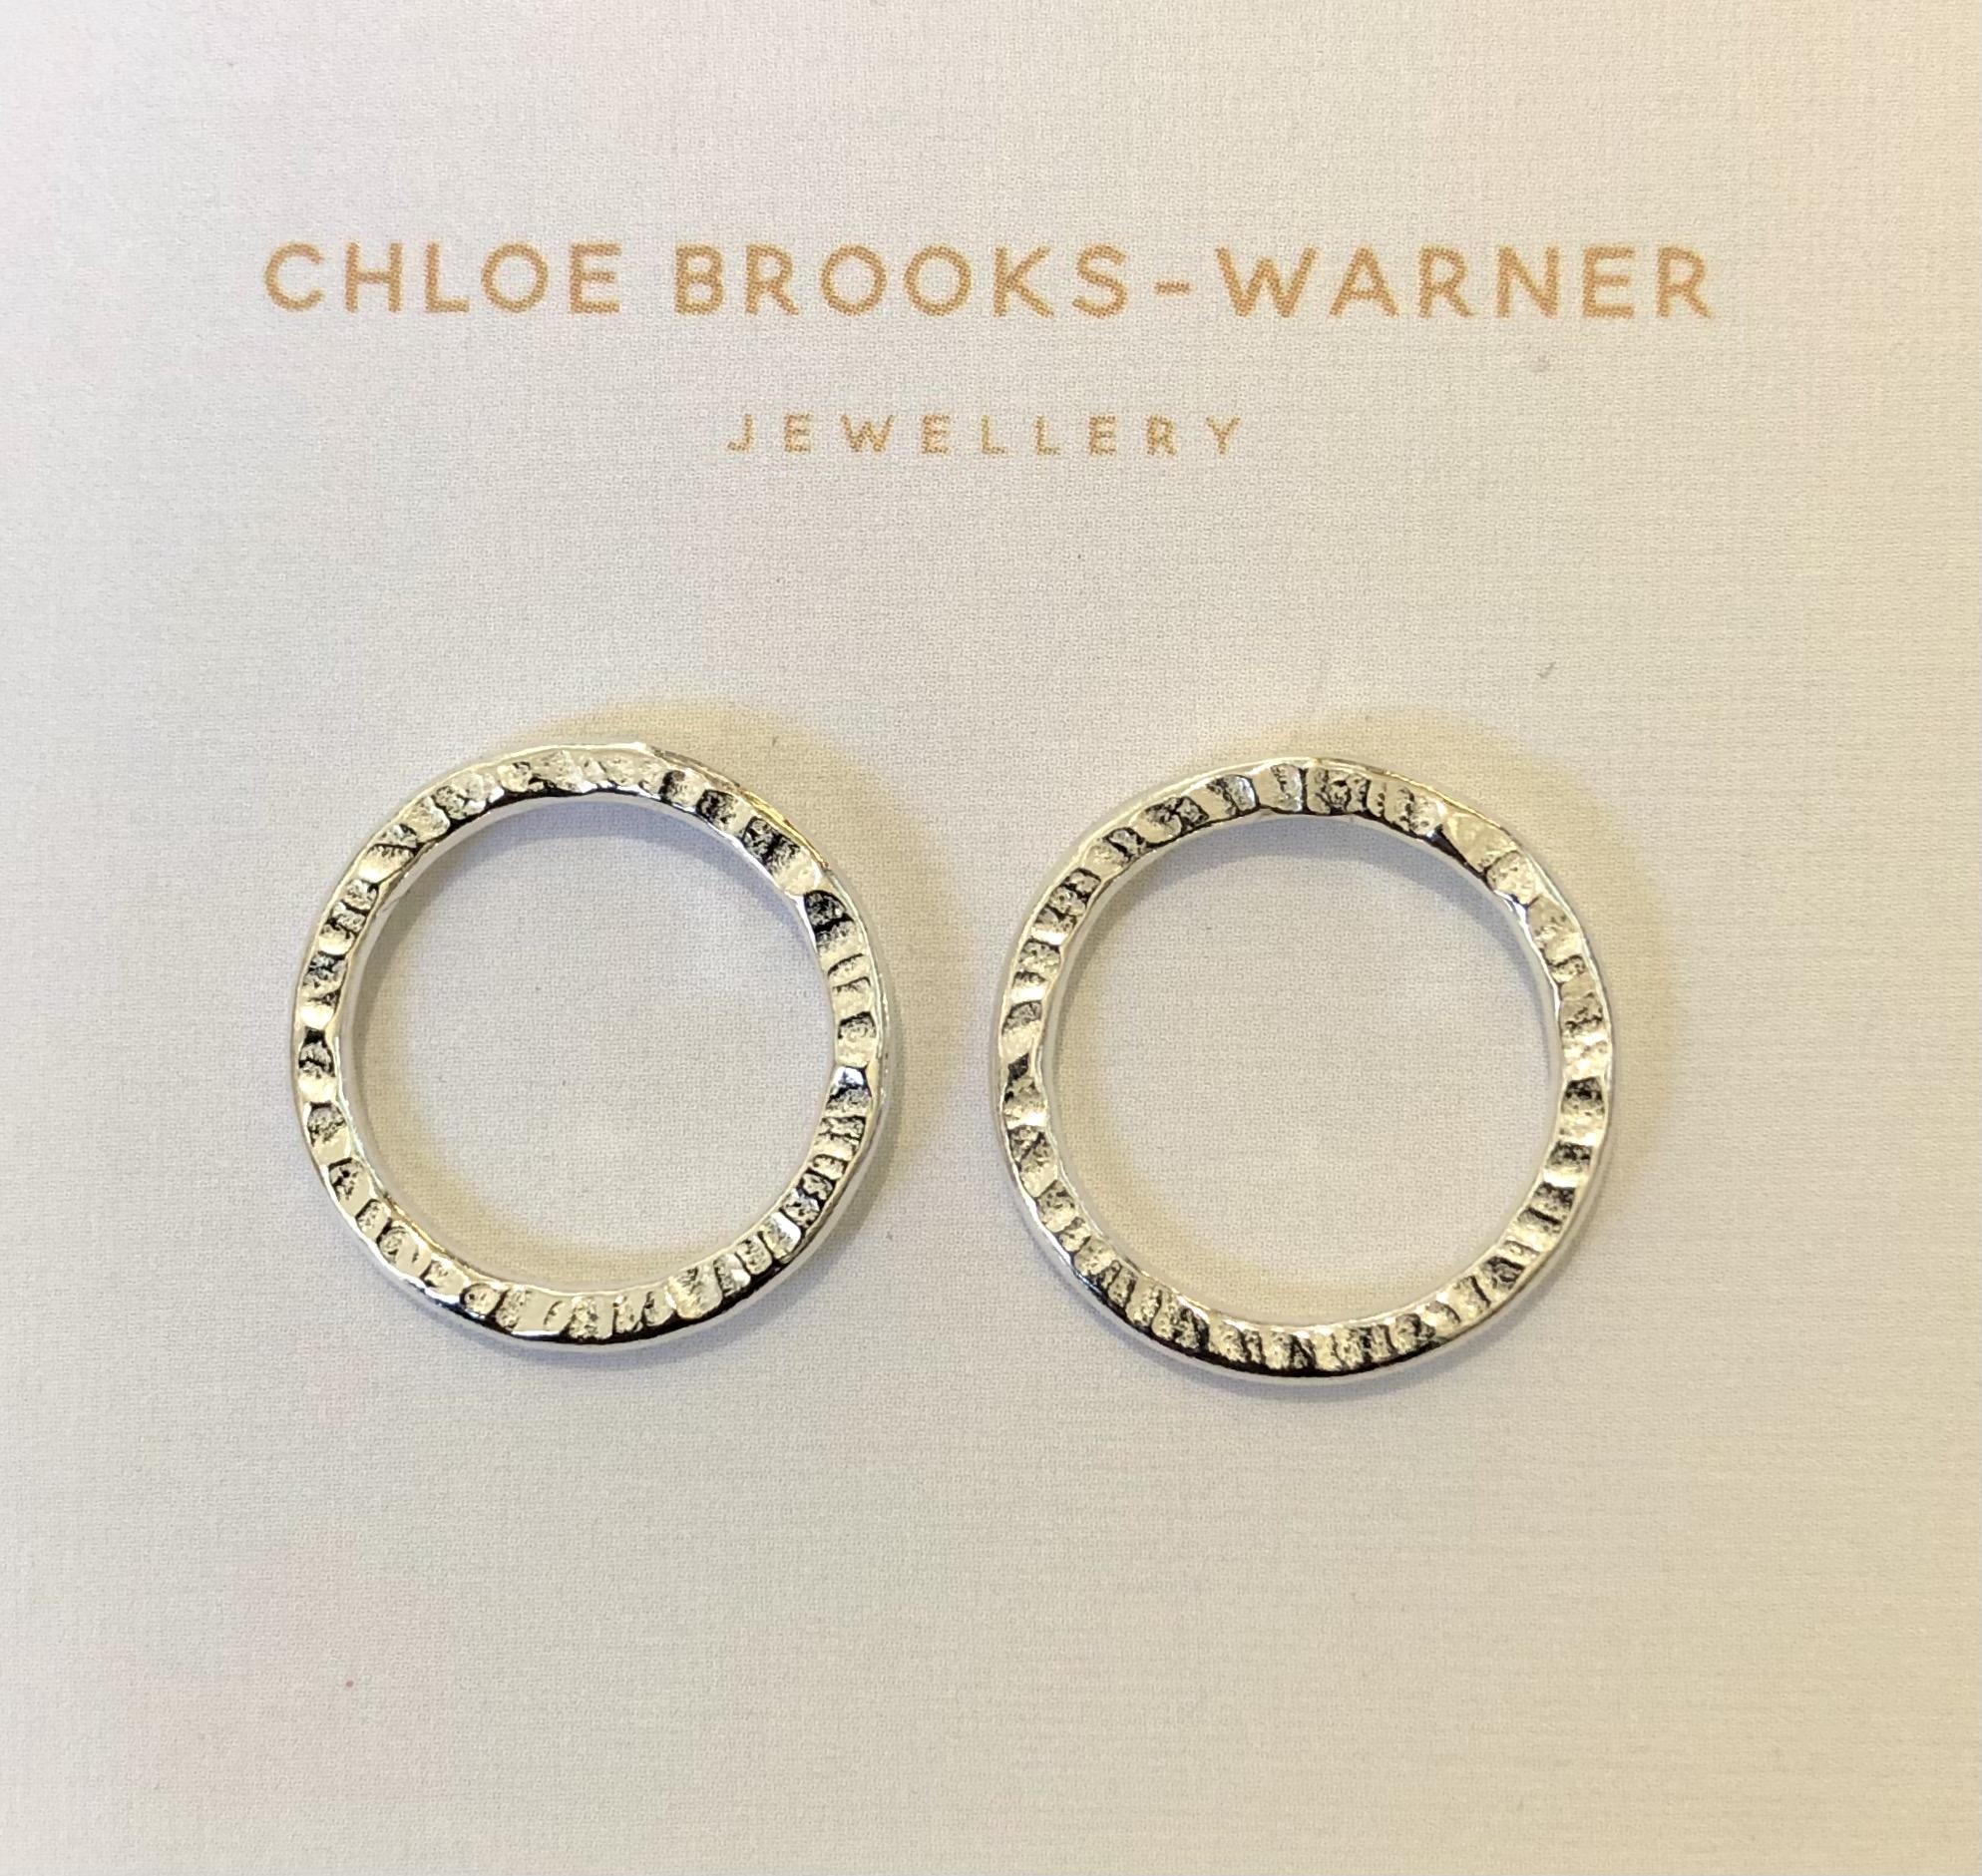 Silver Sun studs by Devon jeweller Chloe Brooks-Warner